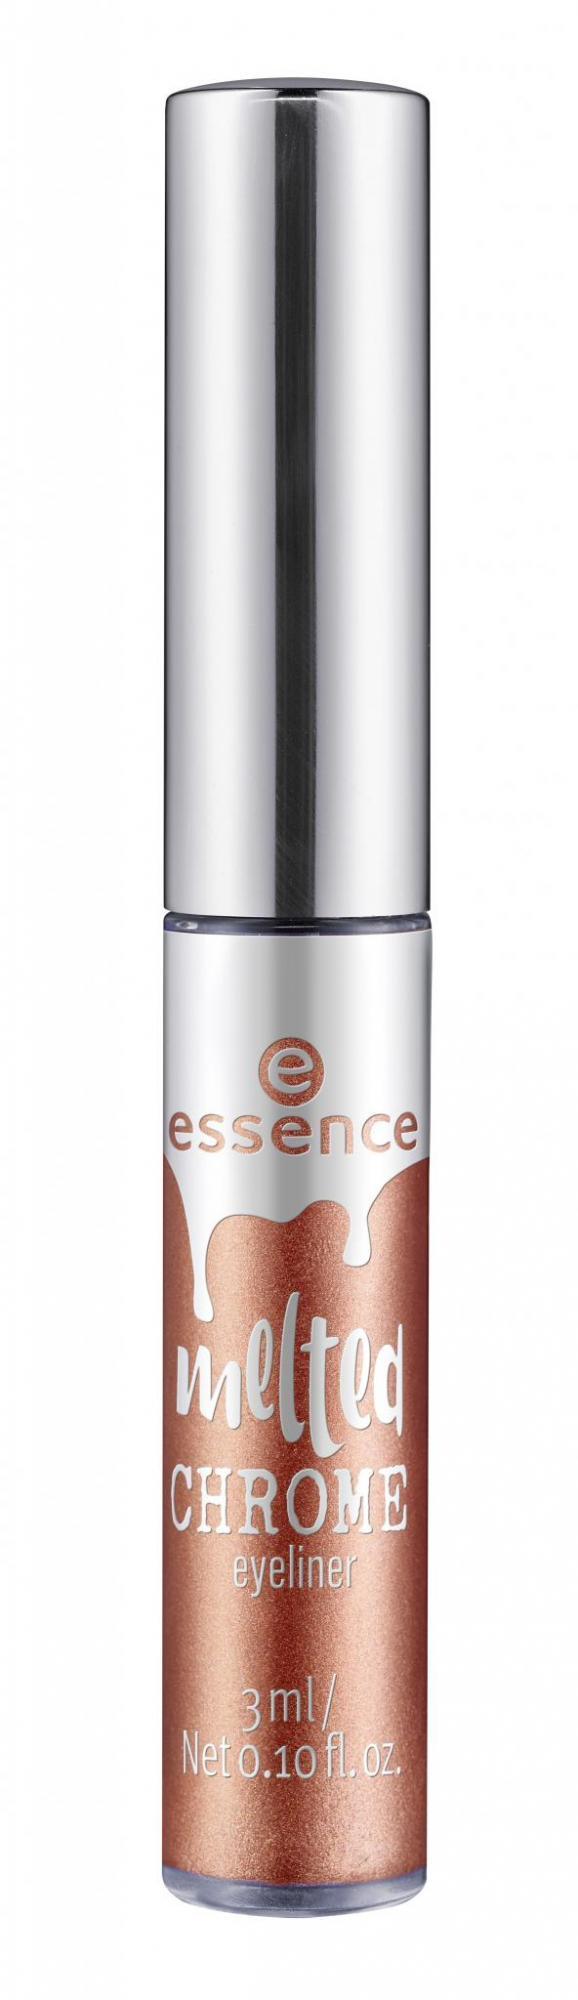 essence-melted-chrome-eyeliner-e3-80jpg-copy